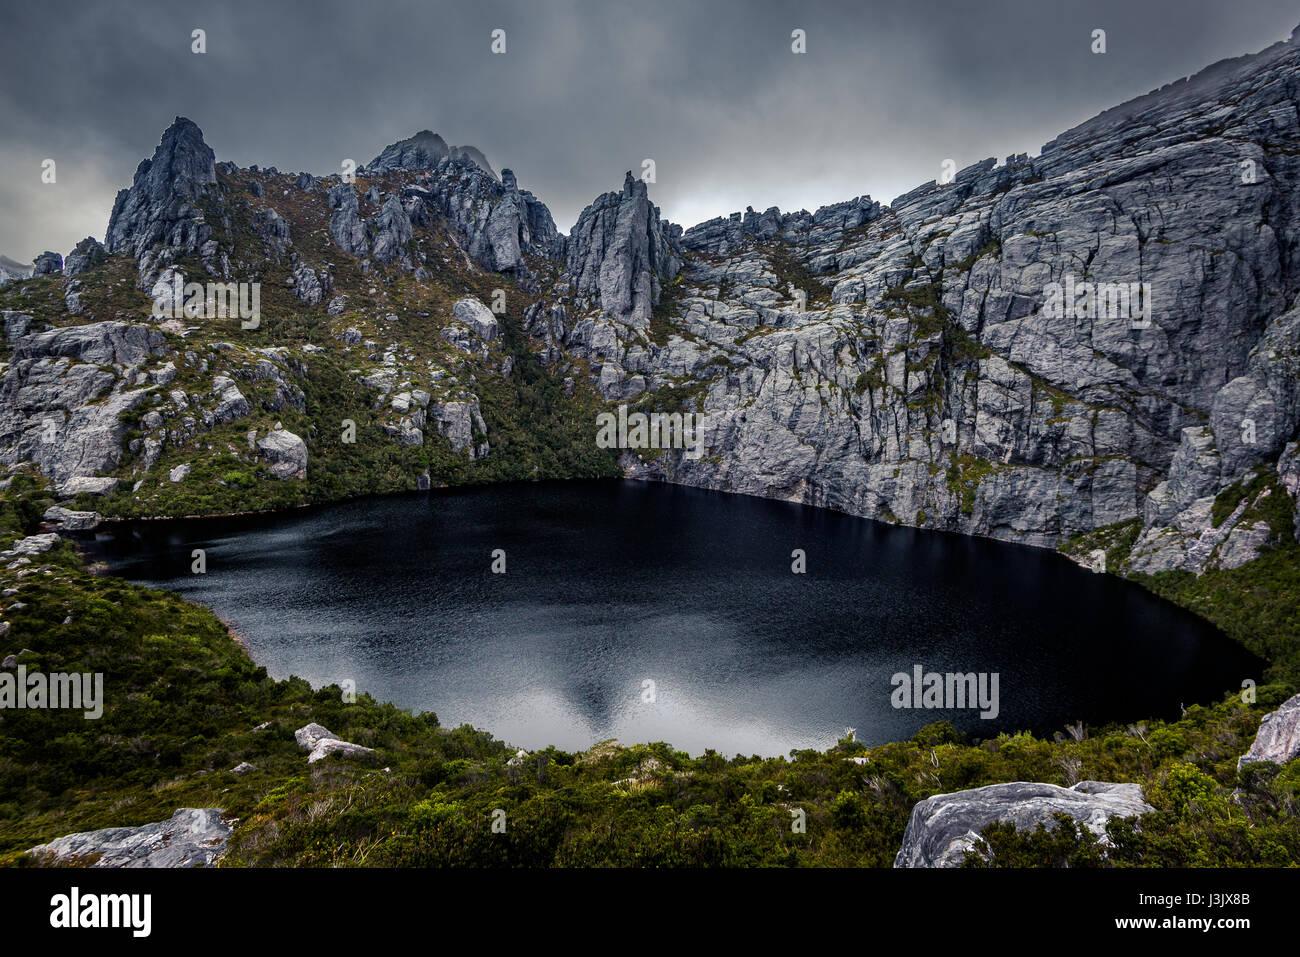 Square Lake in Western Arthur's Range, Southwest Tasmania - Stock Image